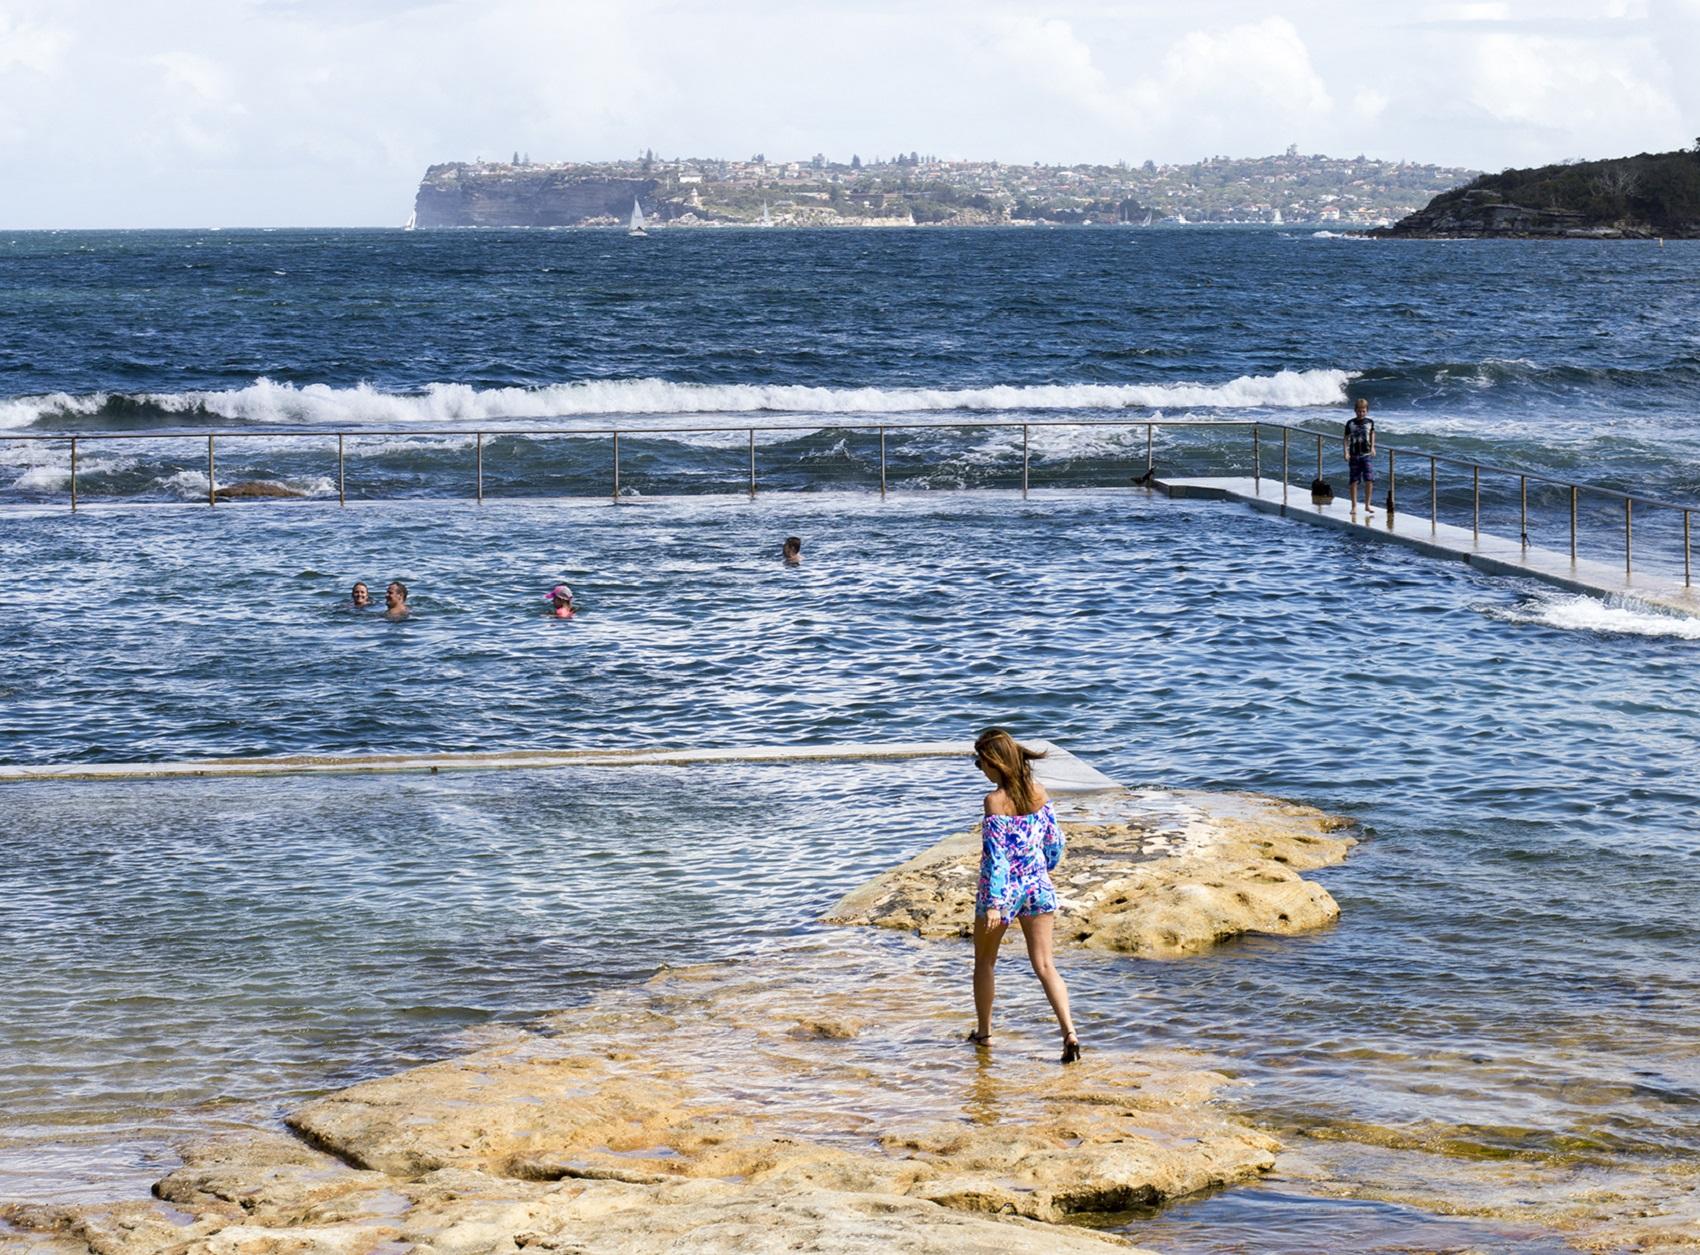 Manly-fairlight-beach-tourism-expat-picks